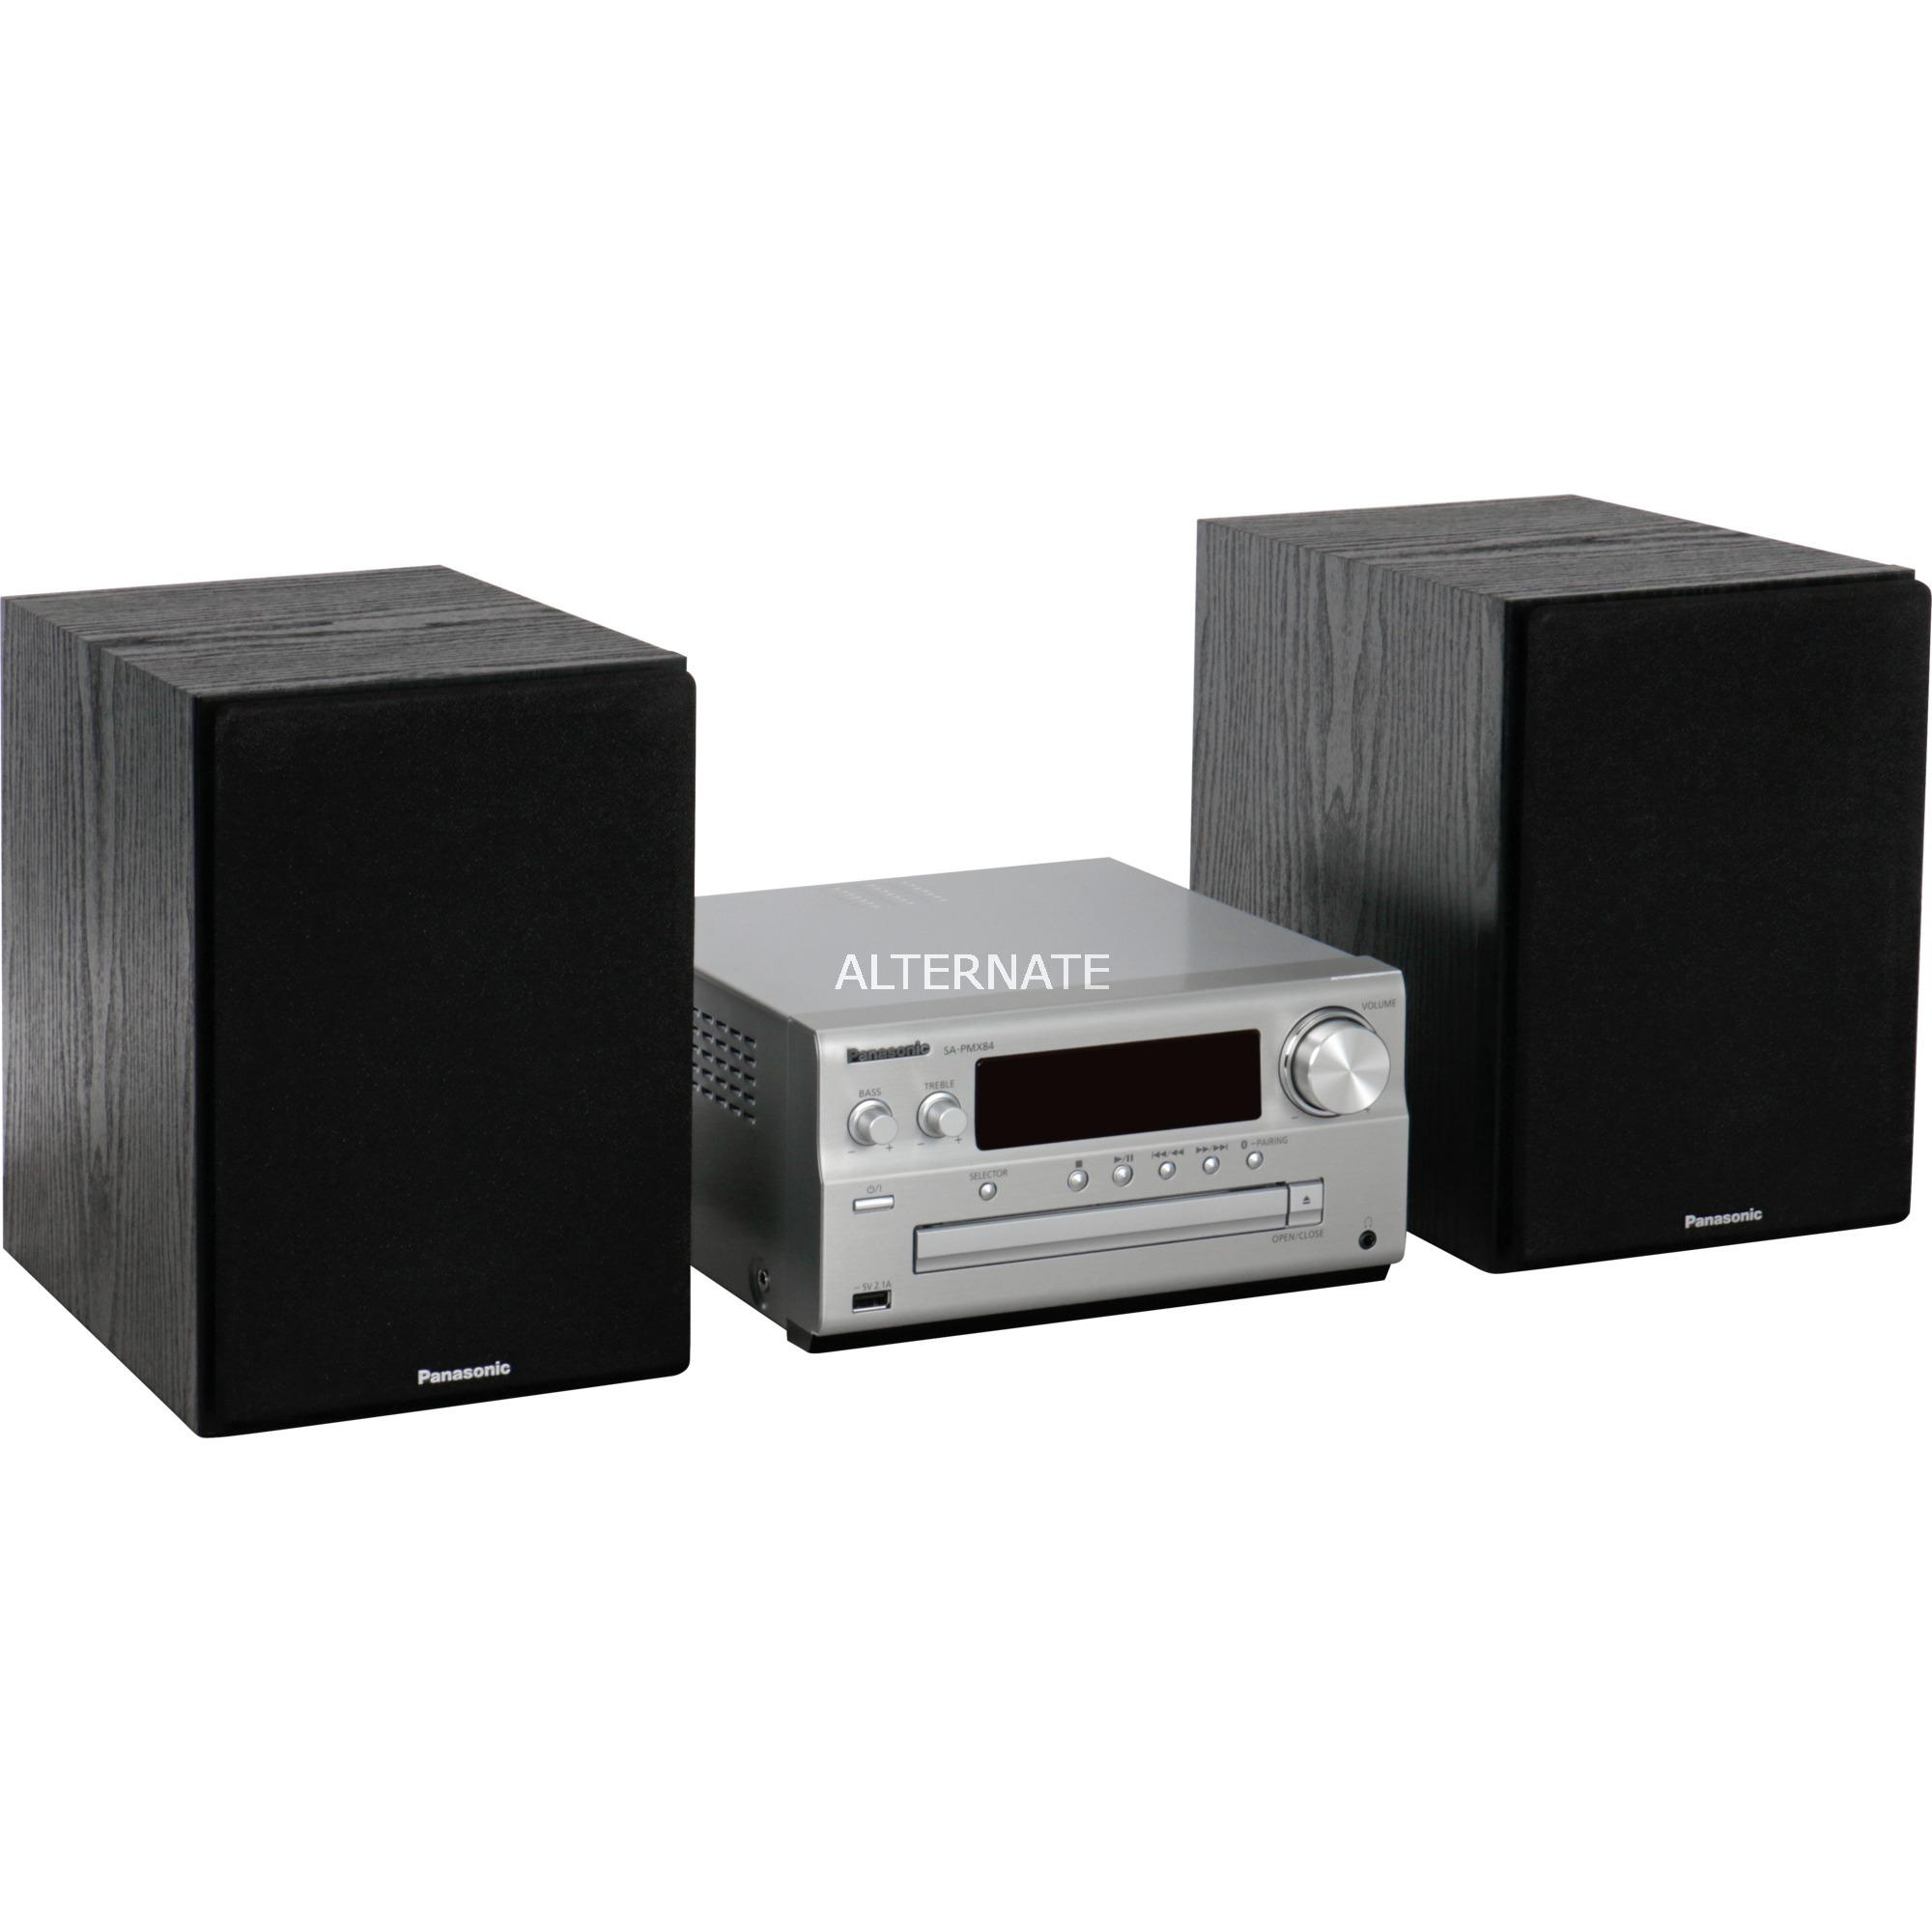 SC-PMX84 Minicadena de música para uso doméstico Negro, Plata 120 W, Equipo compacto